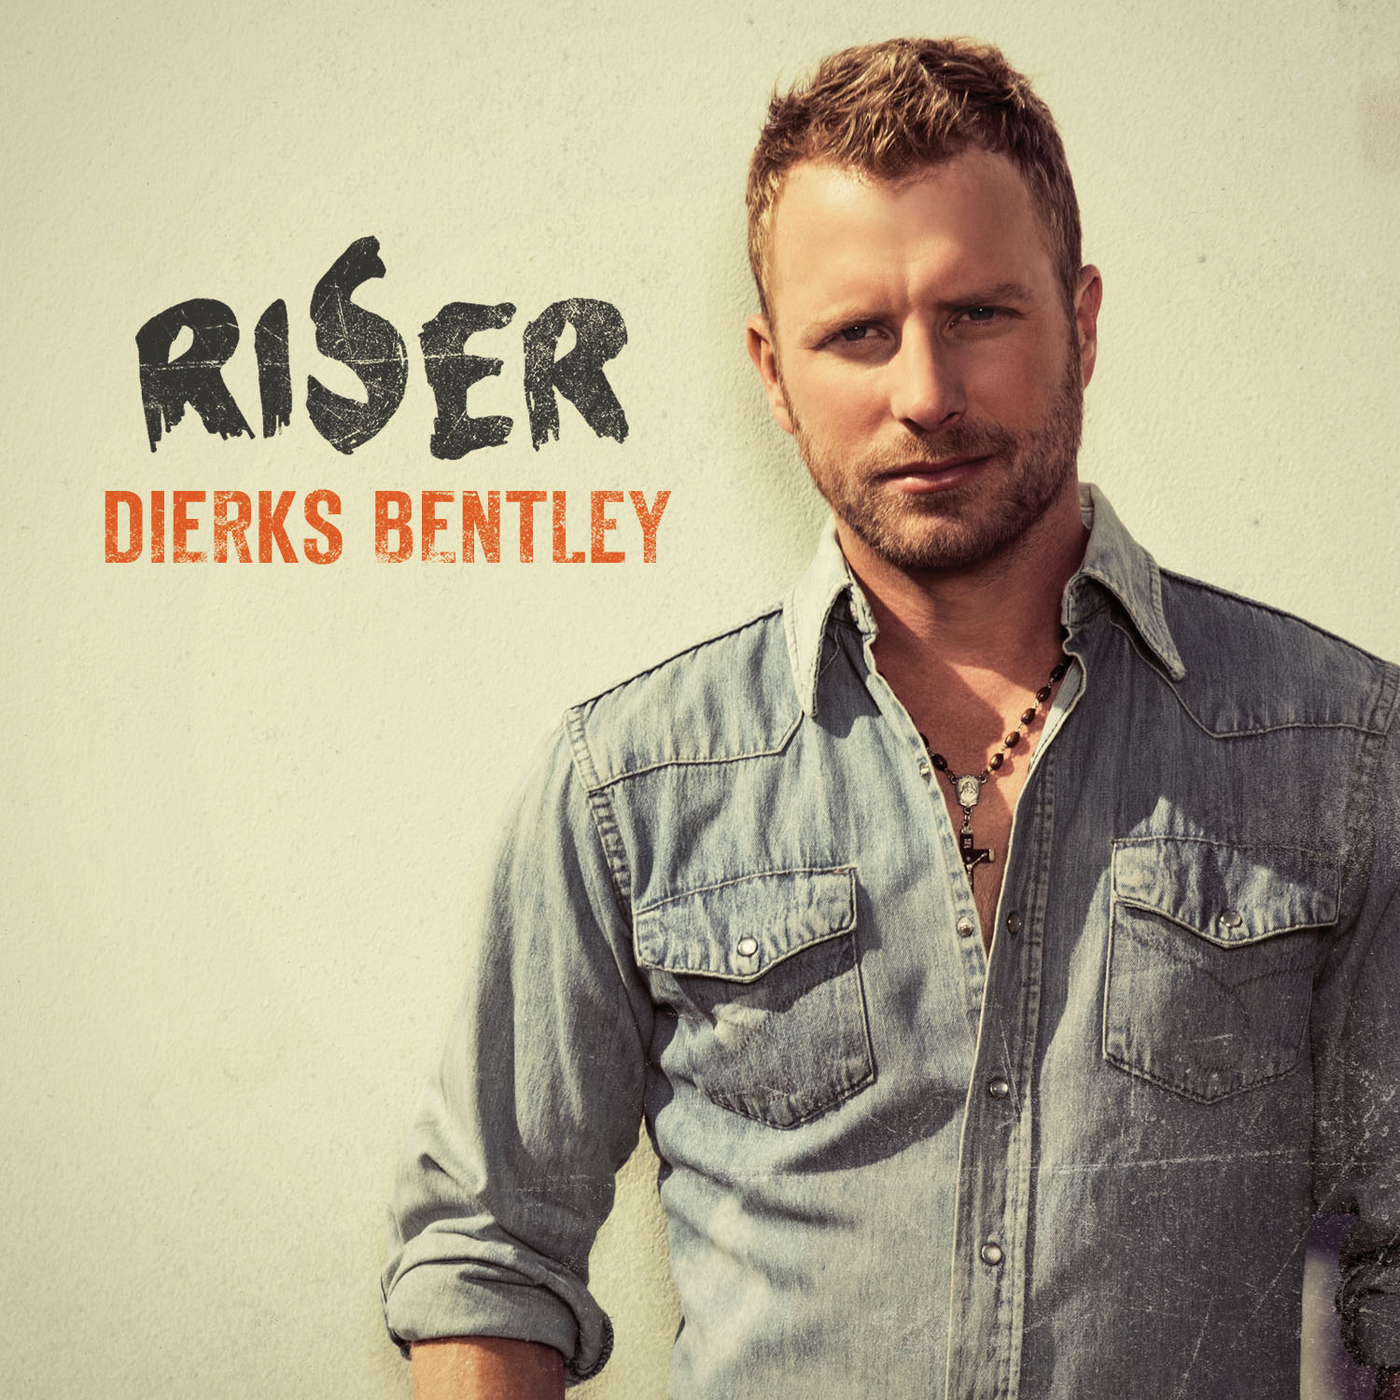 Listen Free to Dierks Bentley - Drunk On A Plane Radio | iHeartRadio